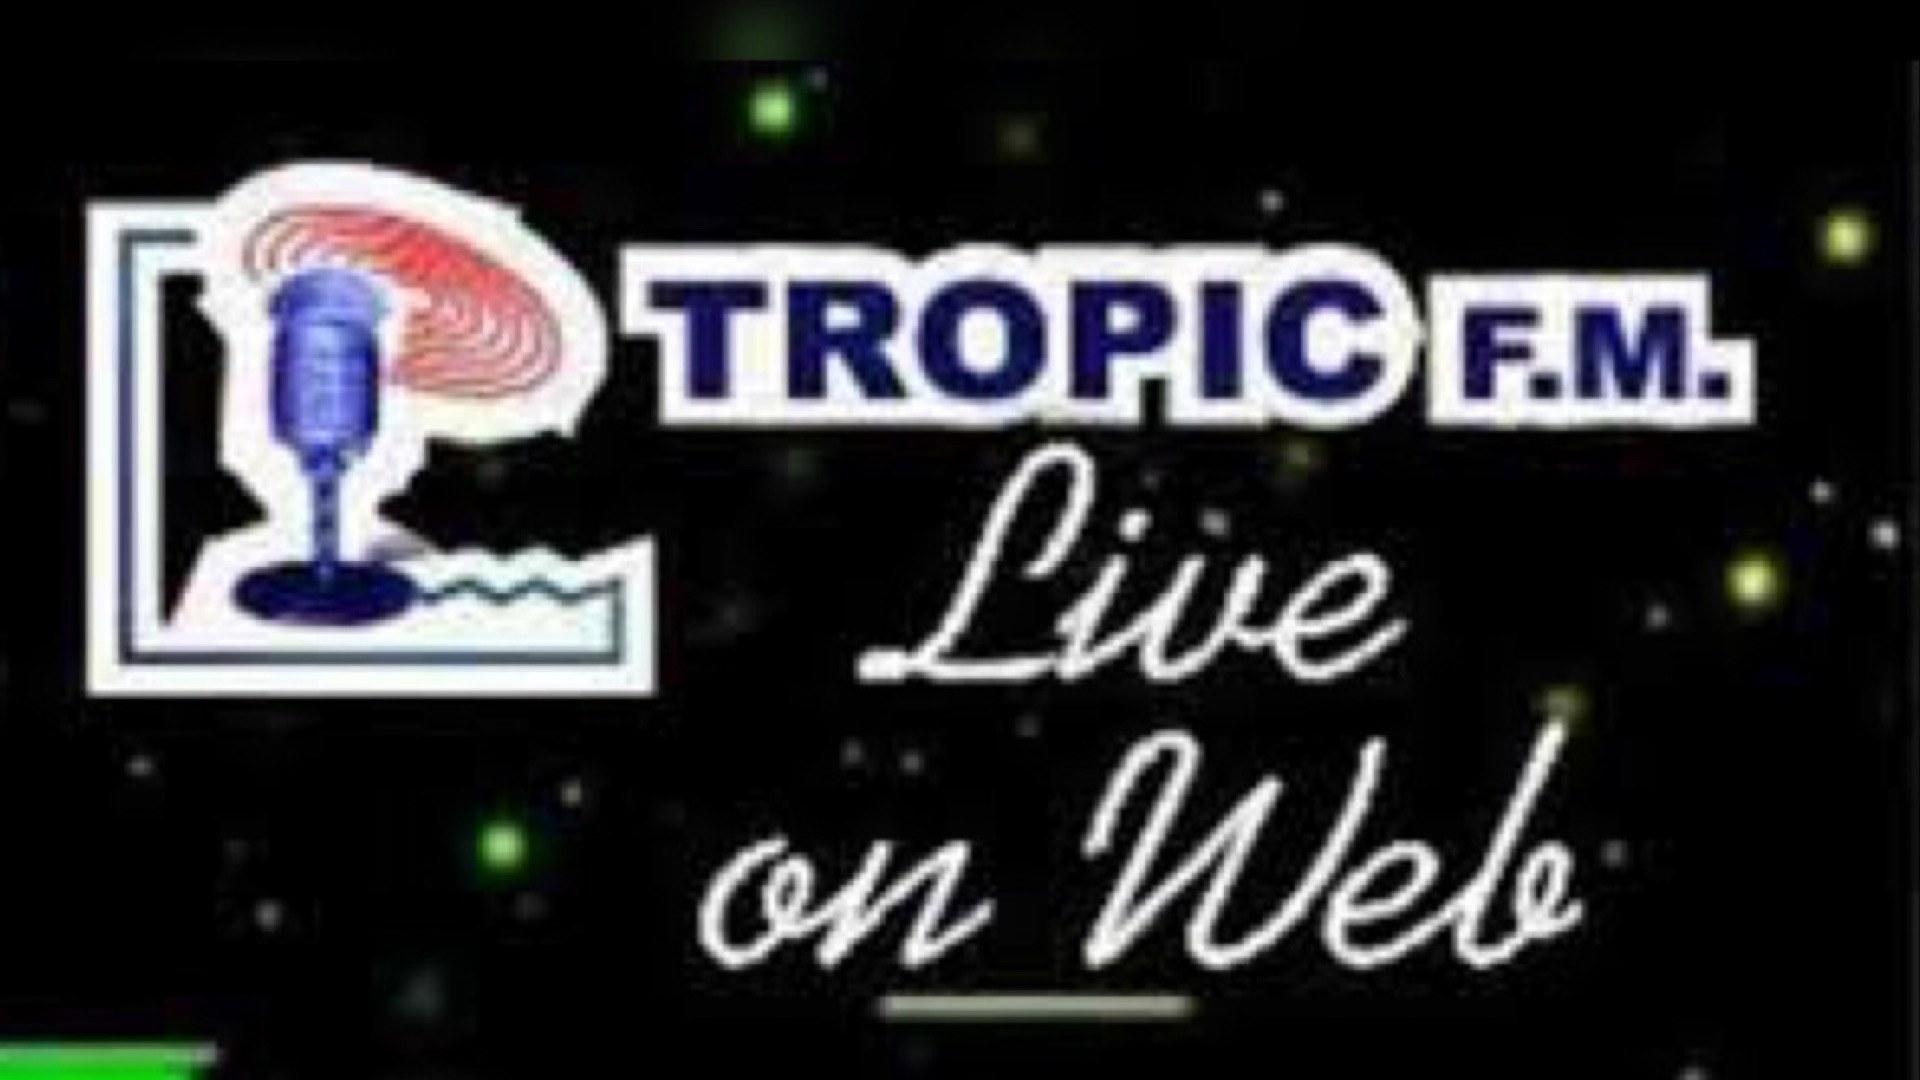 Covid-19: la programmation de Tropic FM reprendra ce 29 juin